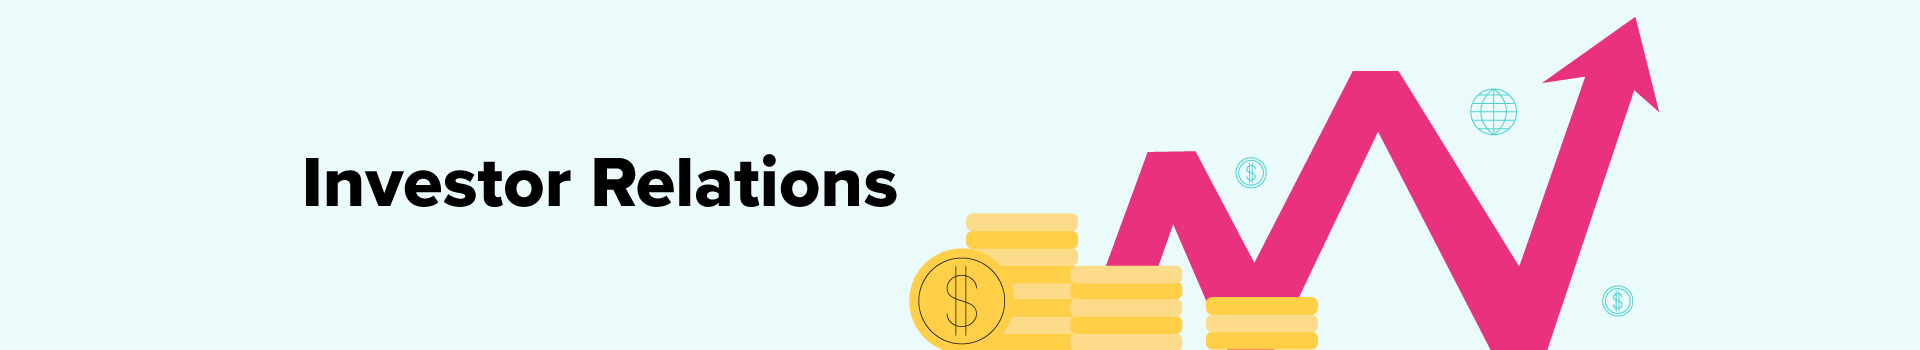 Investor-Relations-banner4